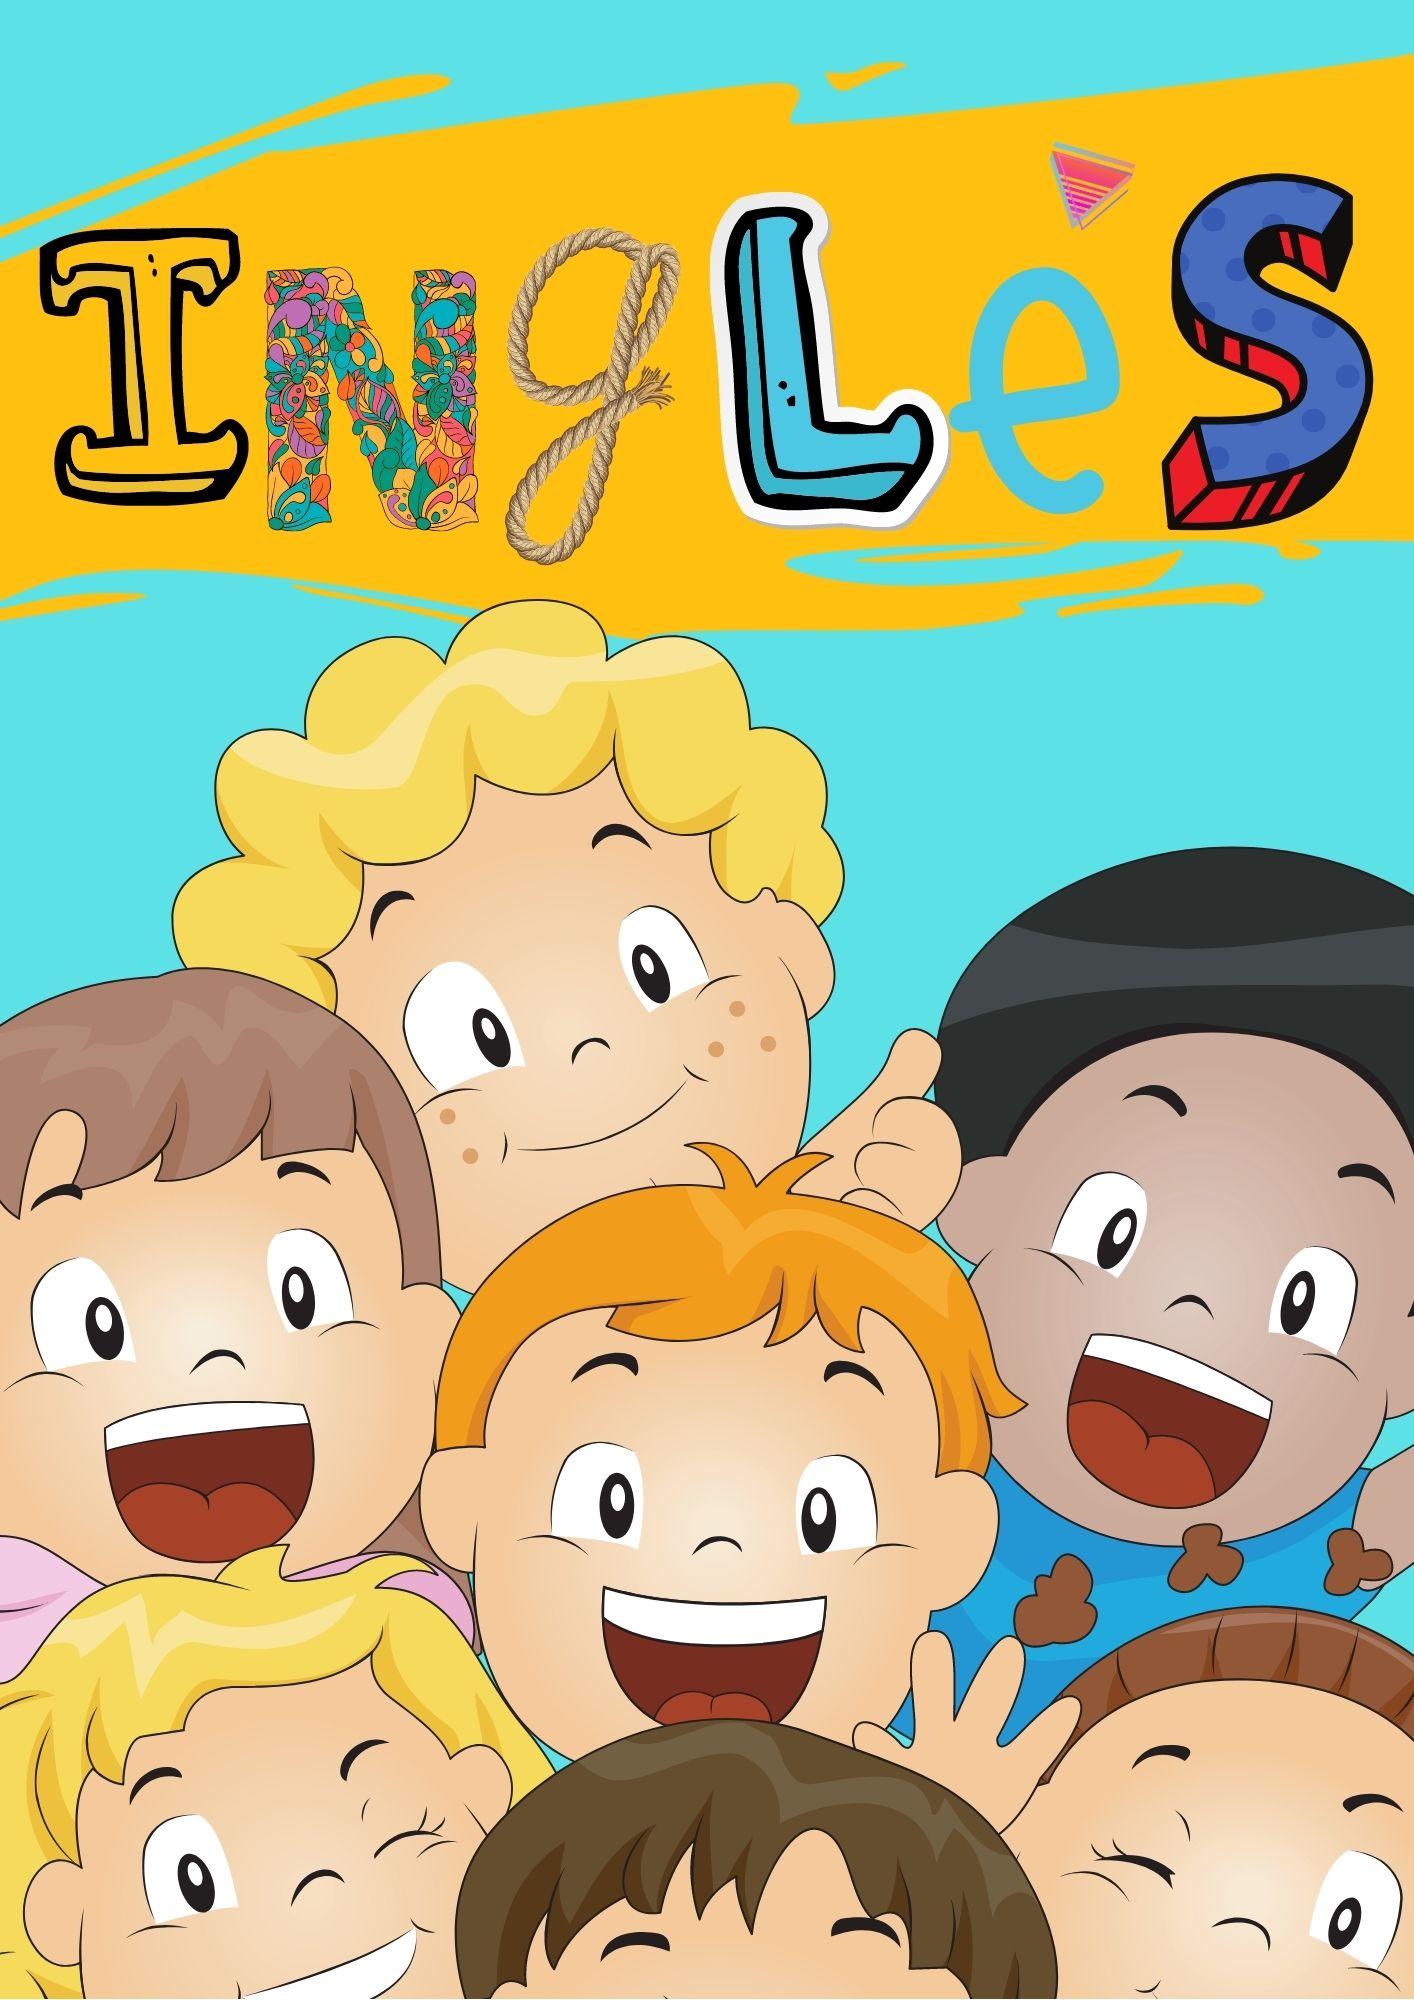 portada inglés para niños 001 jpg